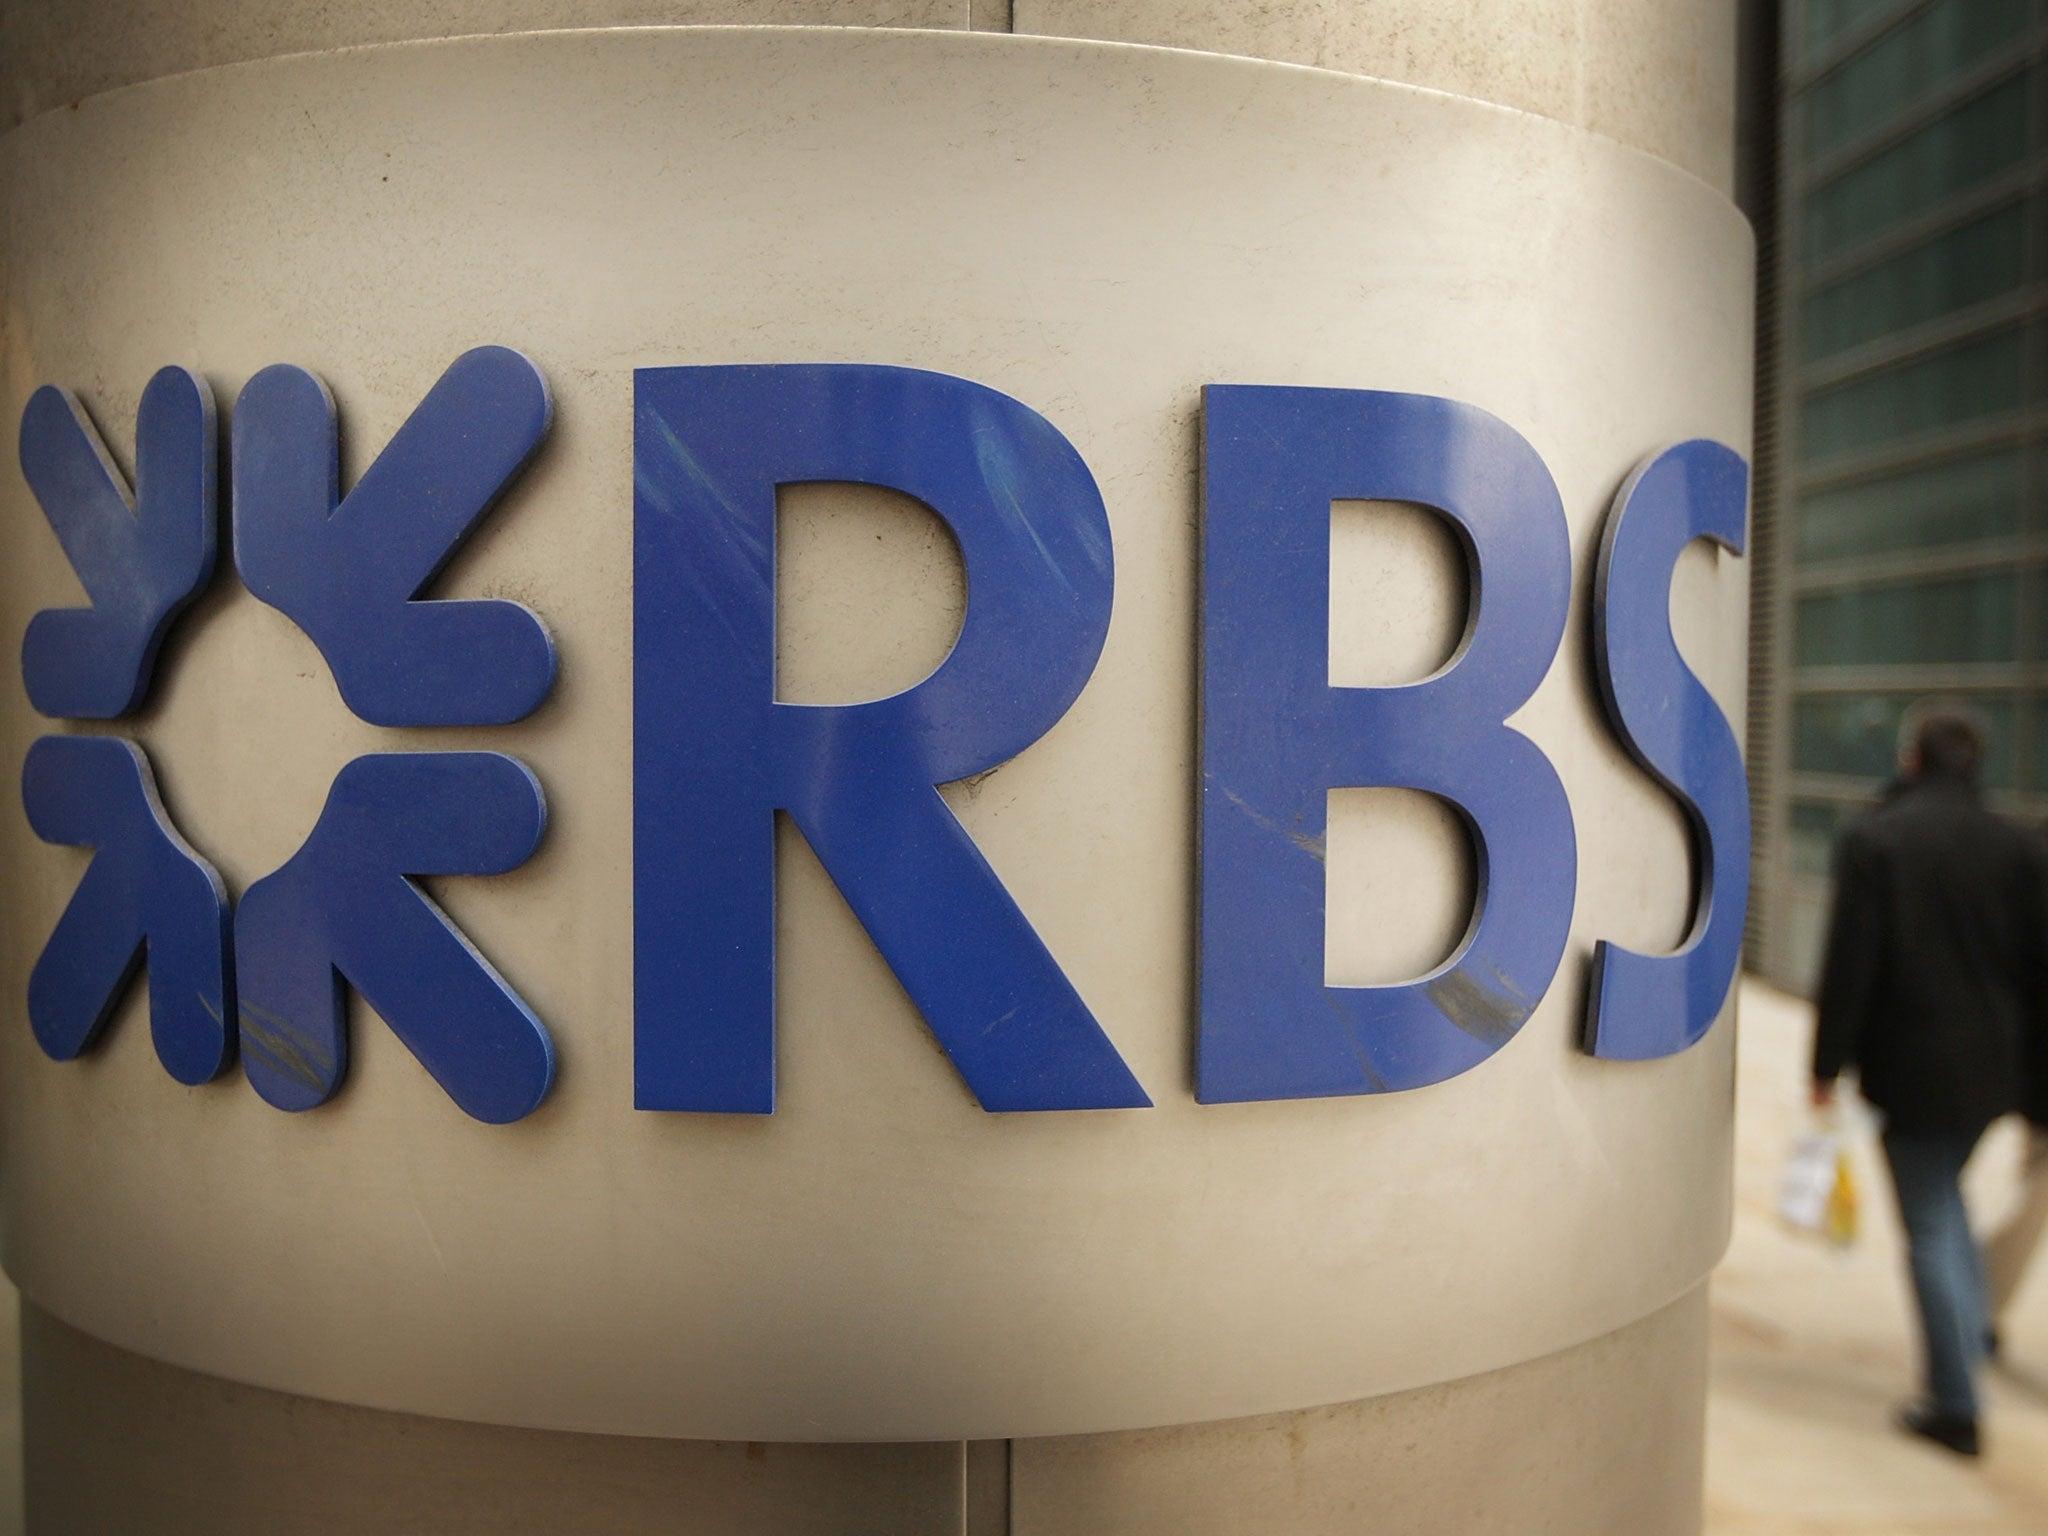 Rbs Gt Delay Tactics In Selling